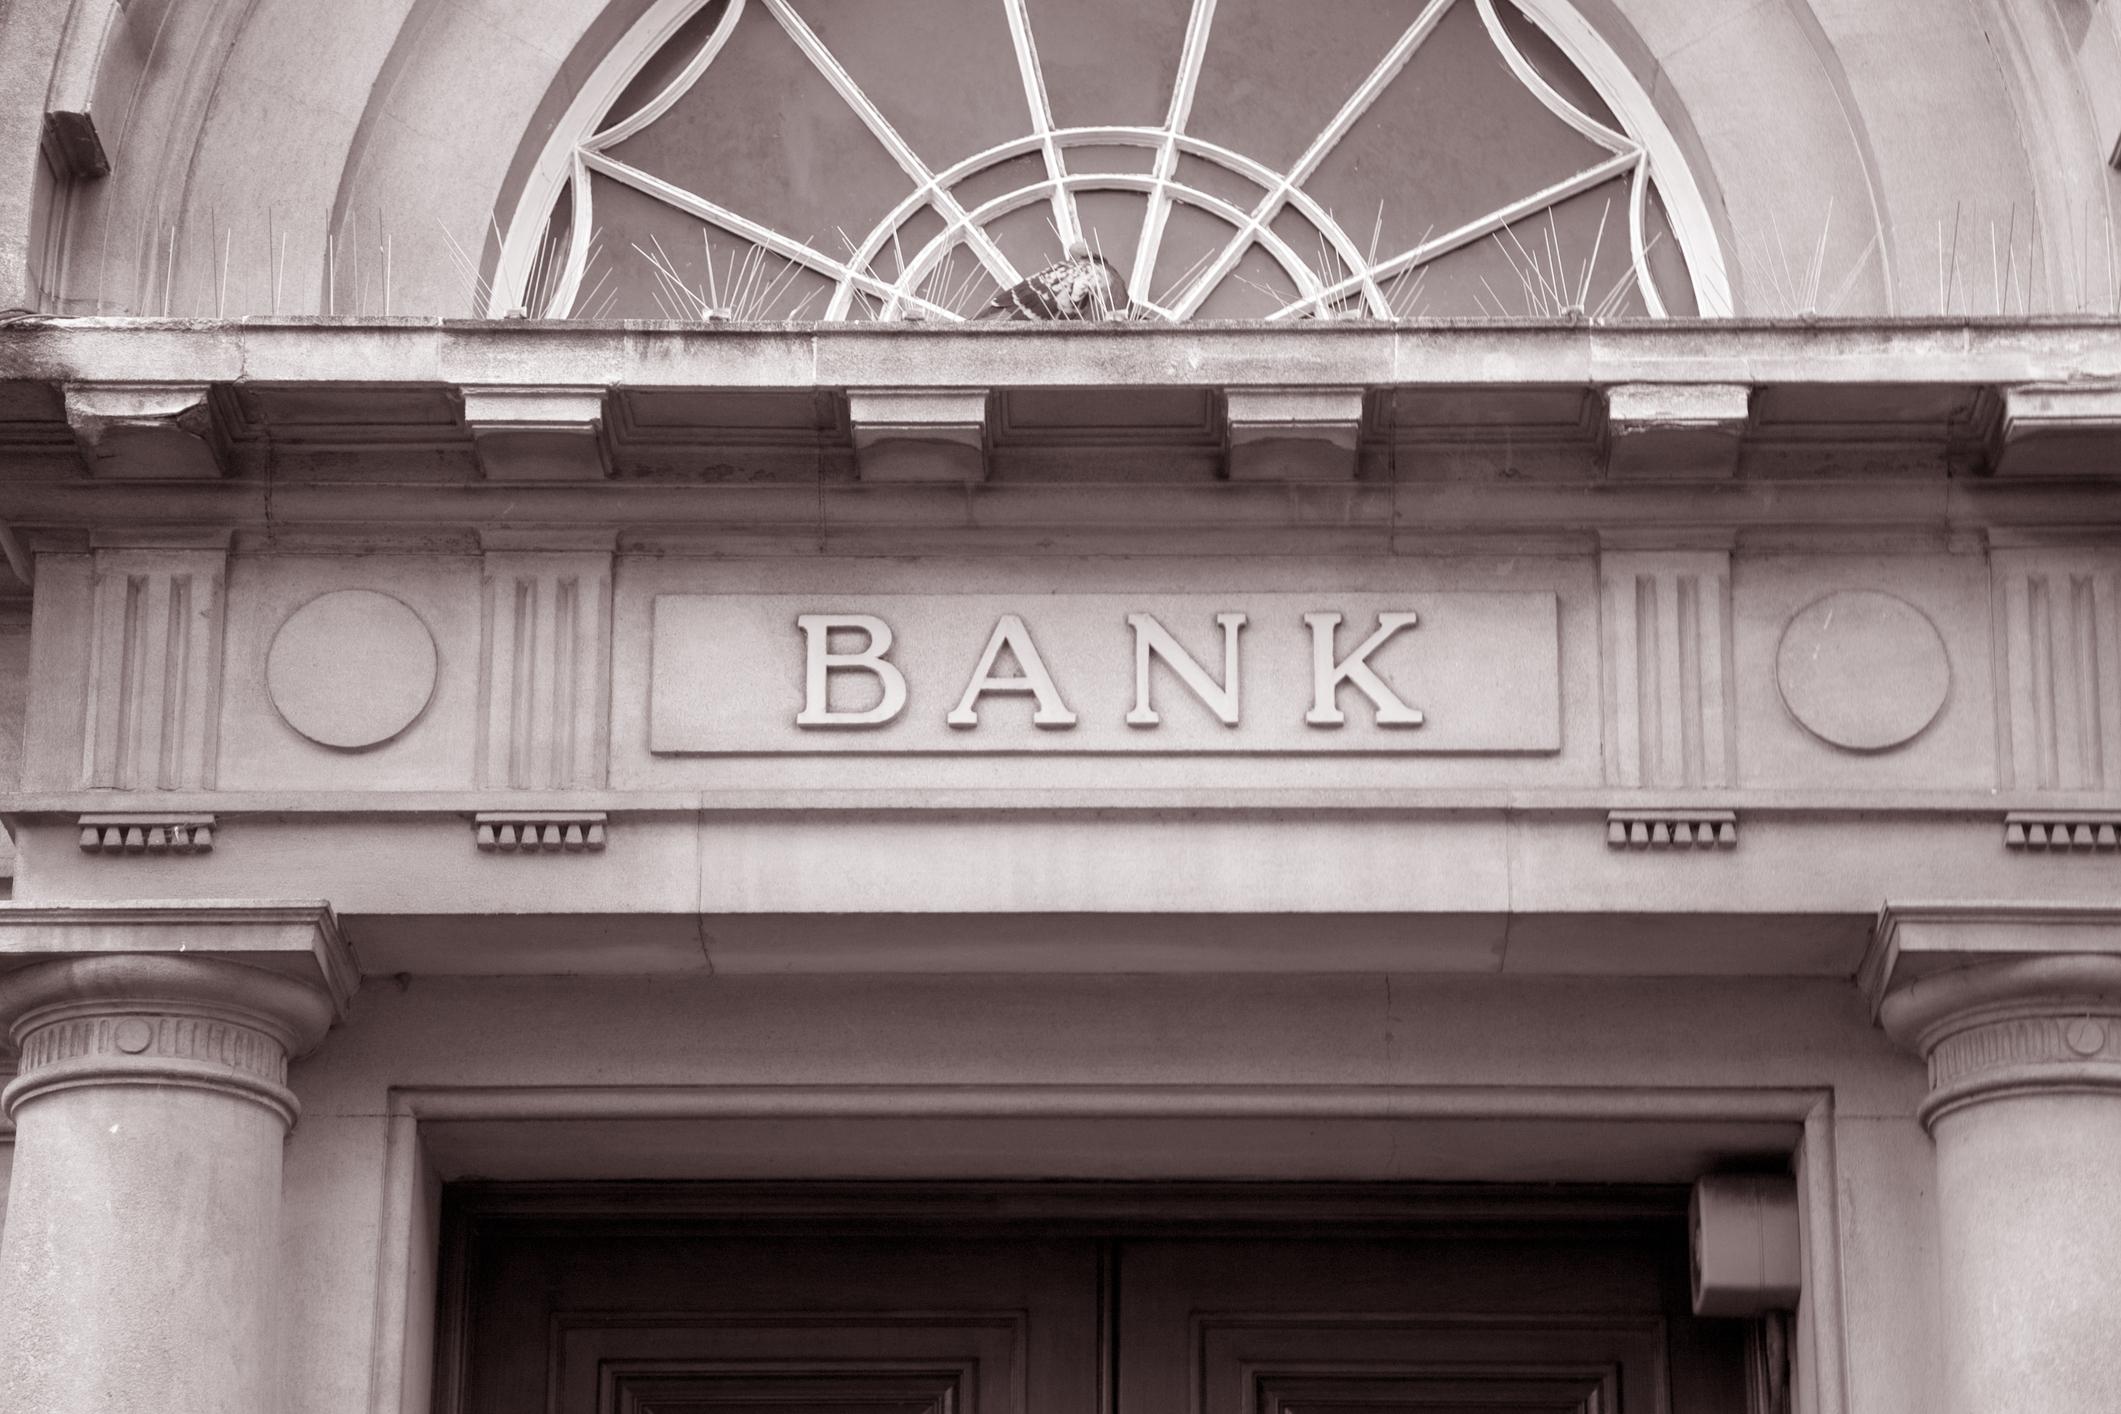 Entrance to a bank building.